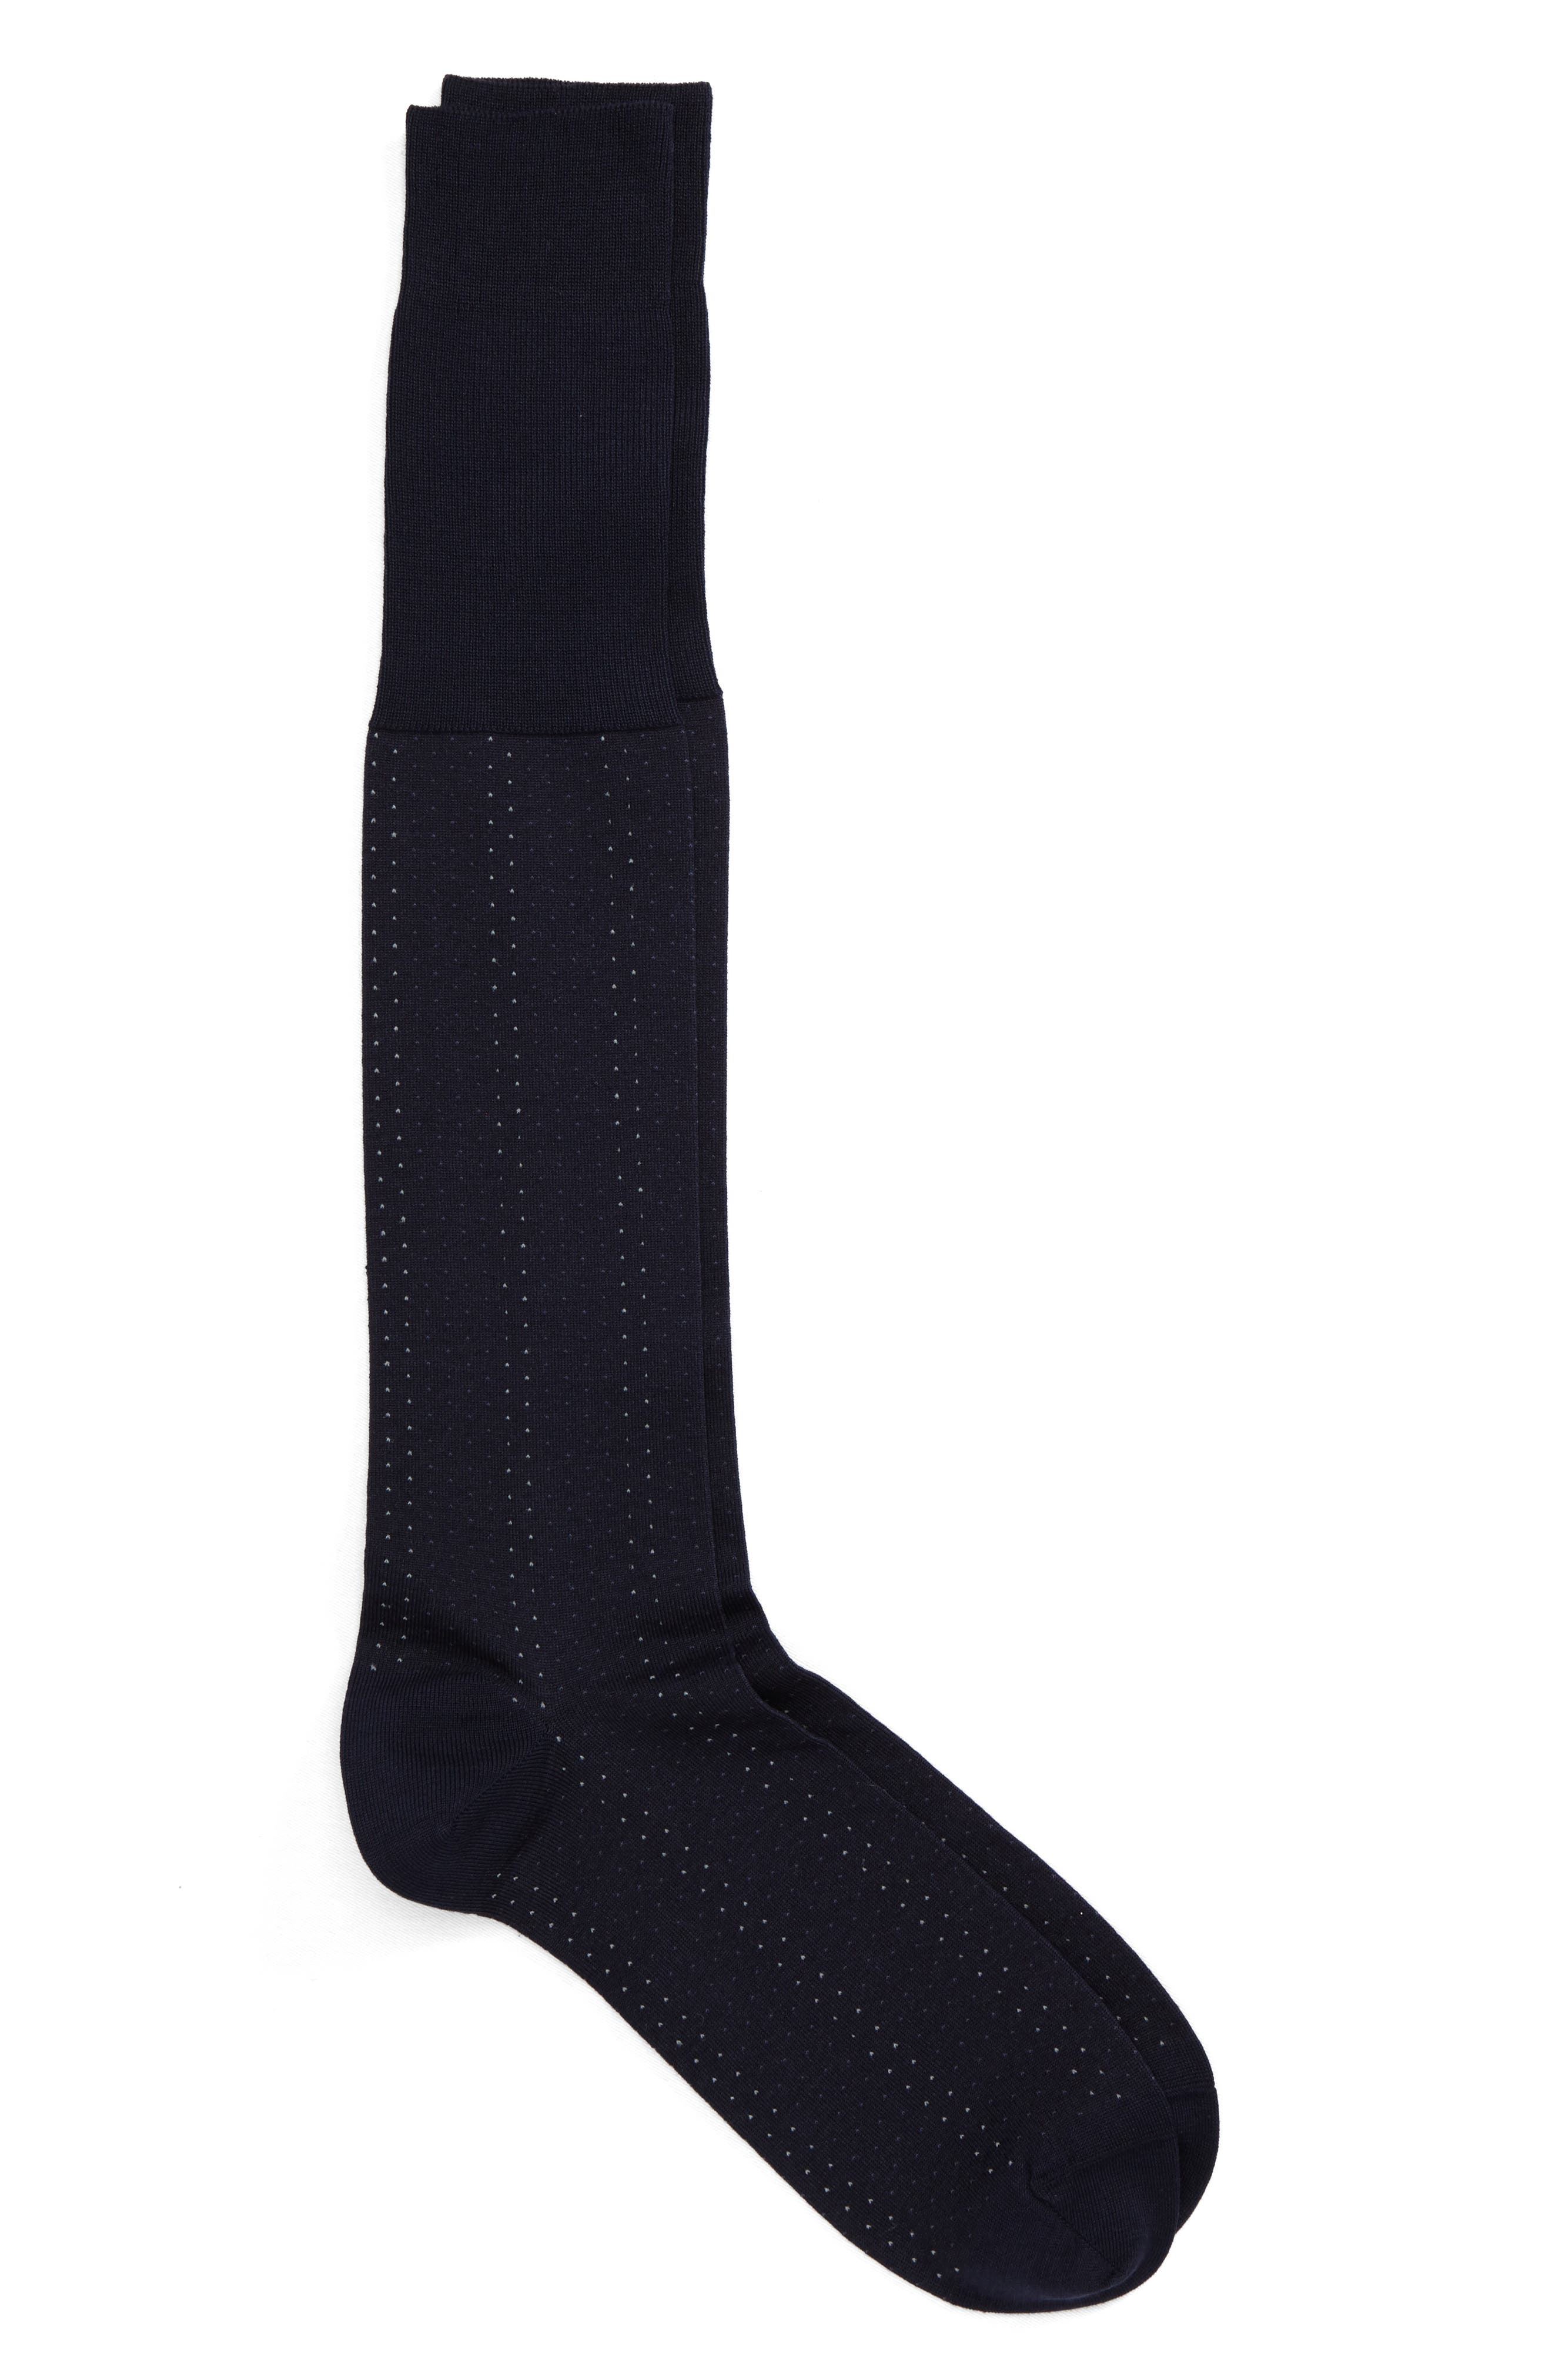 Mini Birdseye Over the Calf Socks,                         Main,                         color, Navy/ Blue